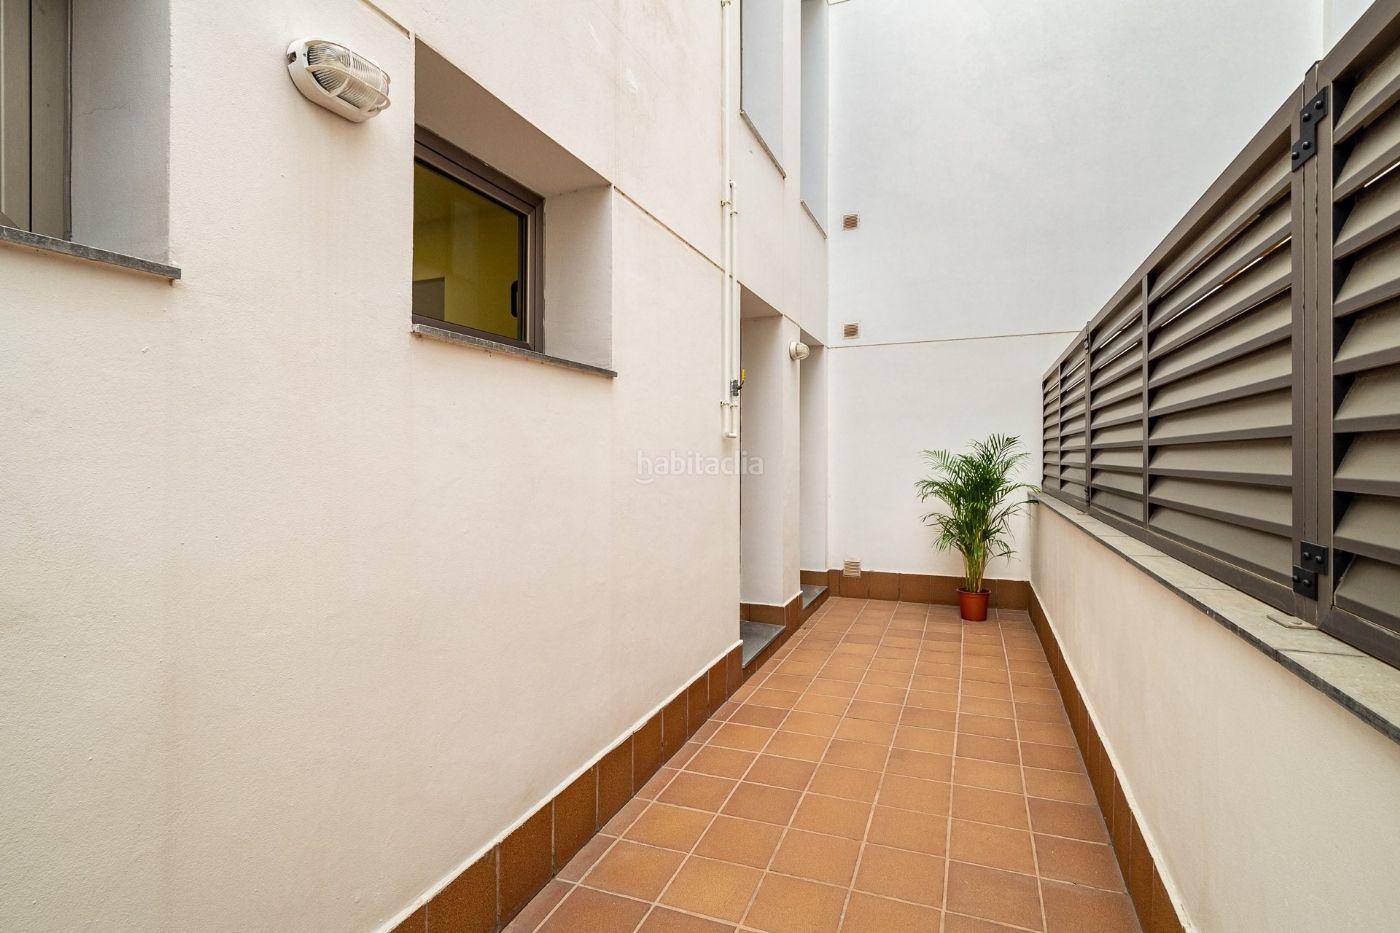 Vivienda con terraza Santa Coloma de Cervelló